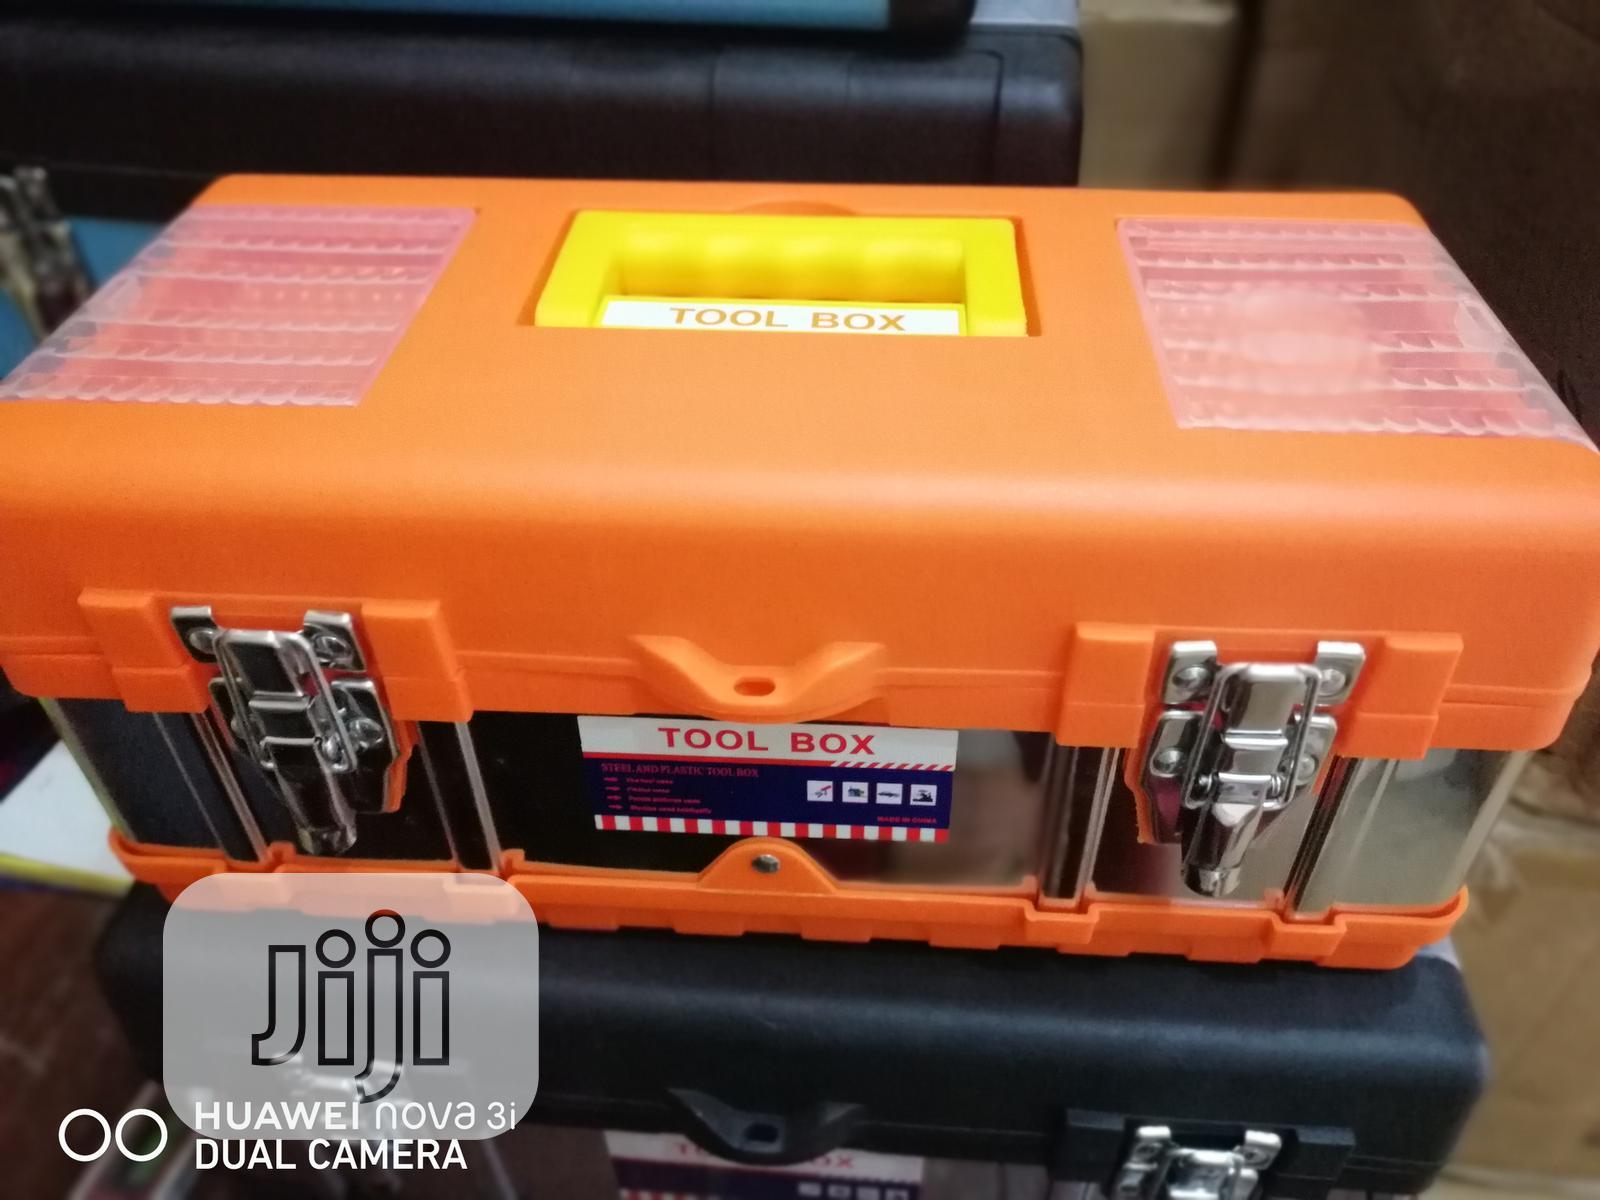 Empty Tools Box 17 Inches